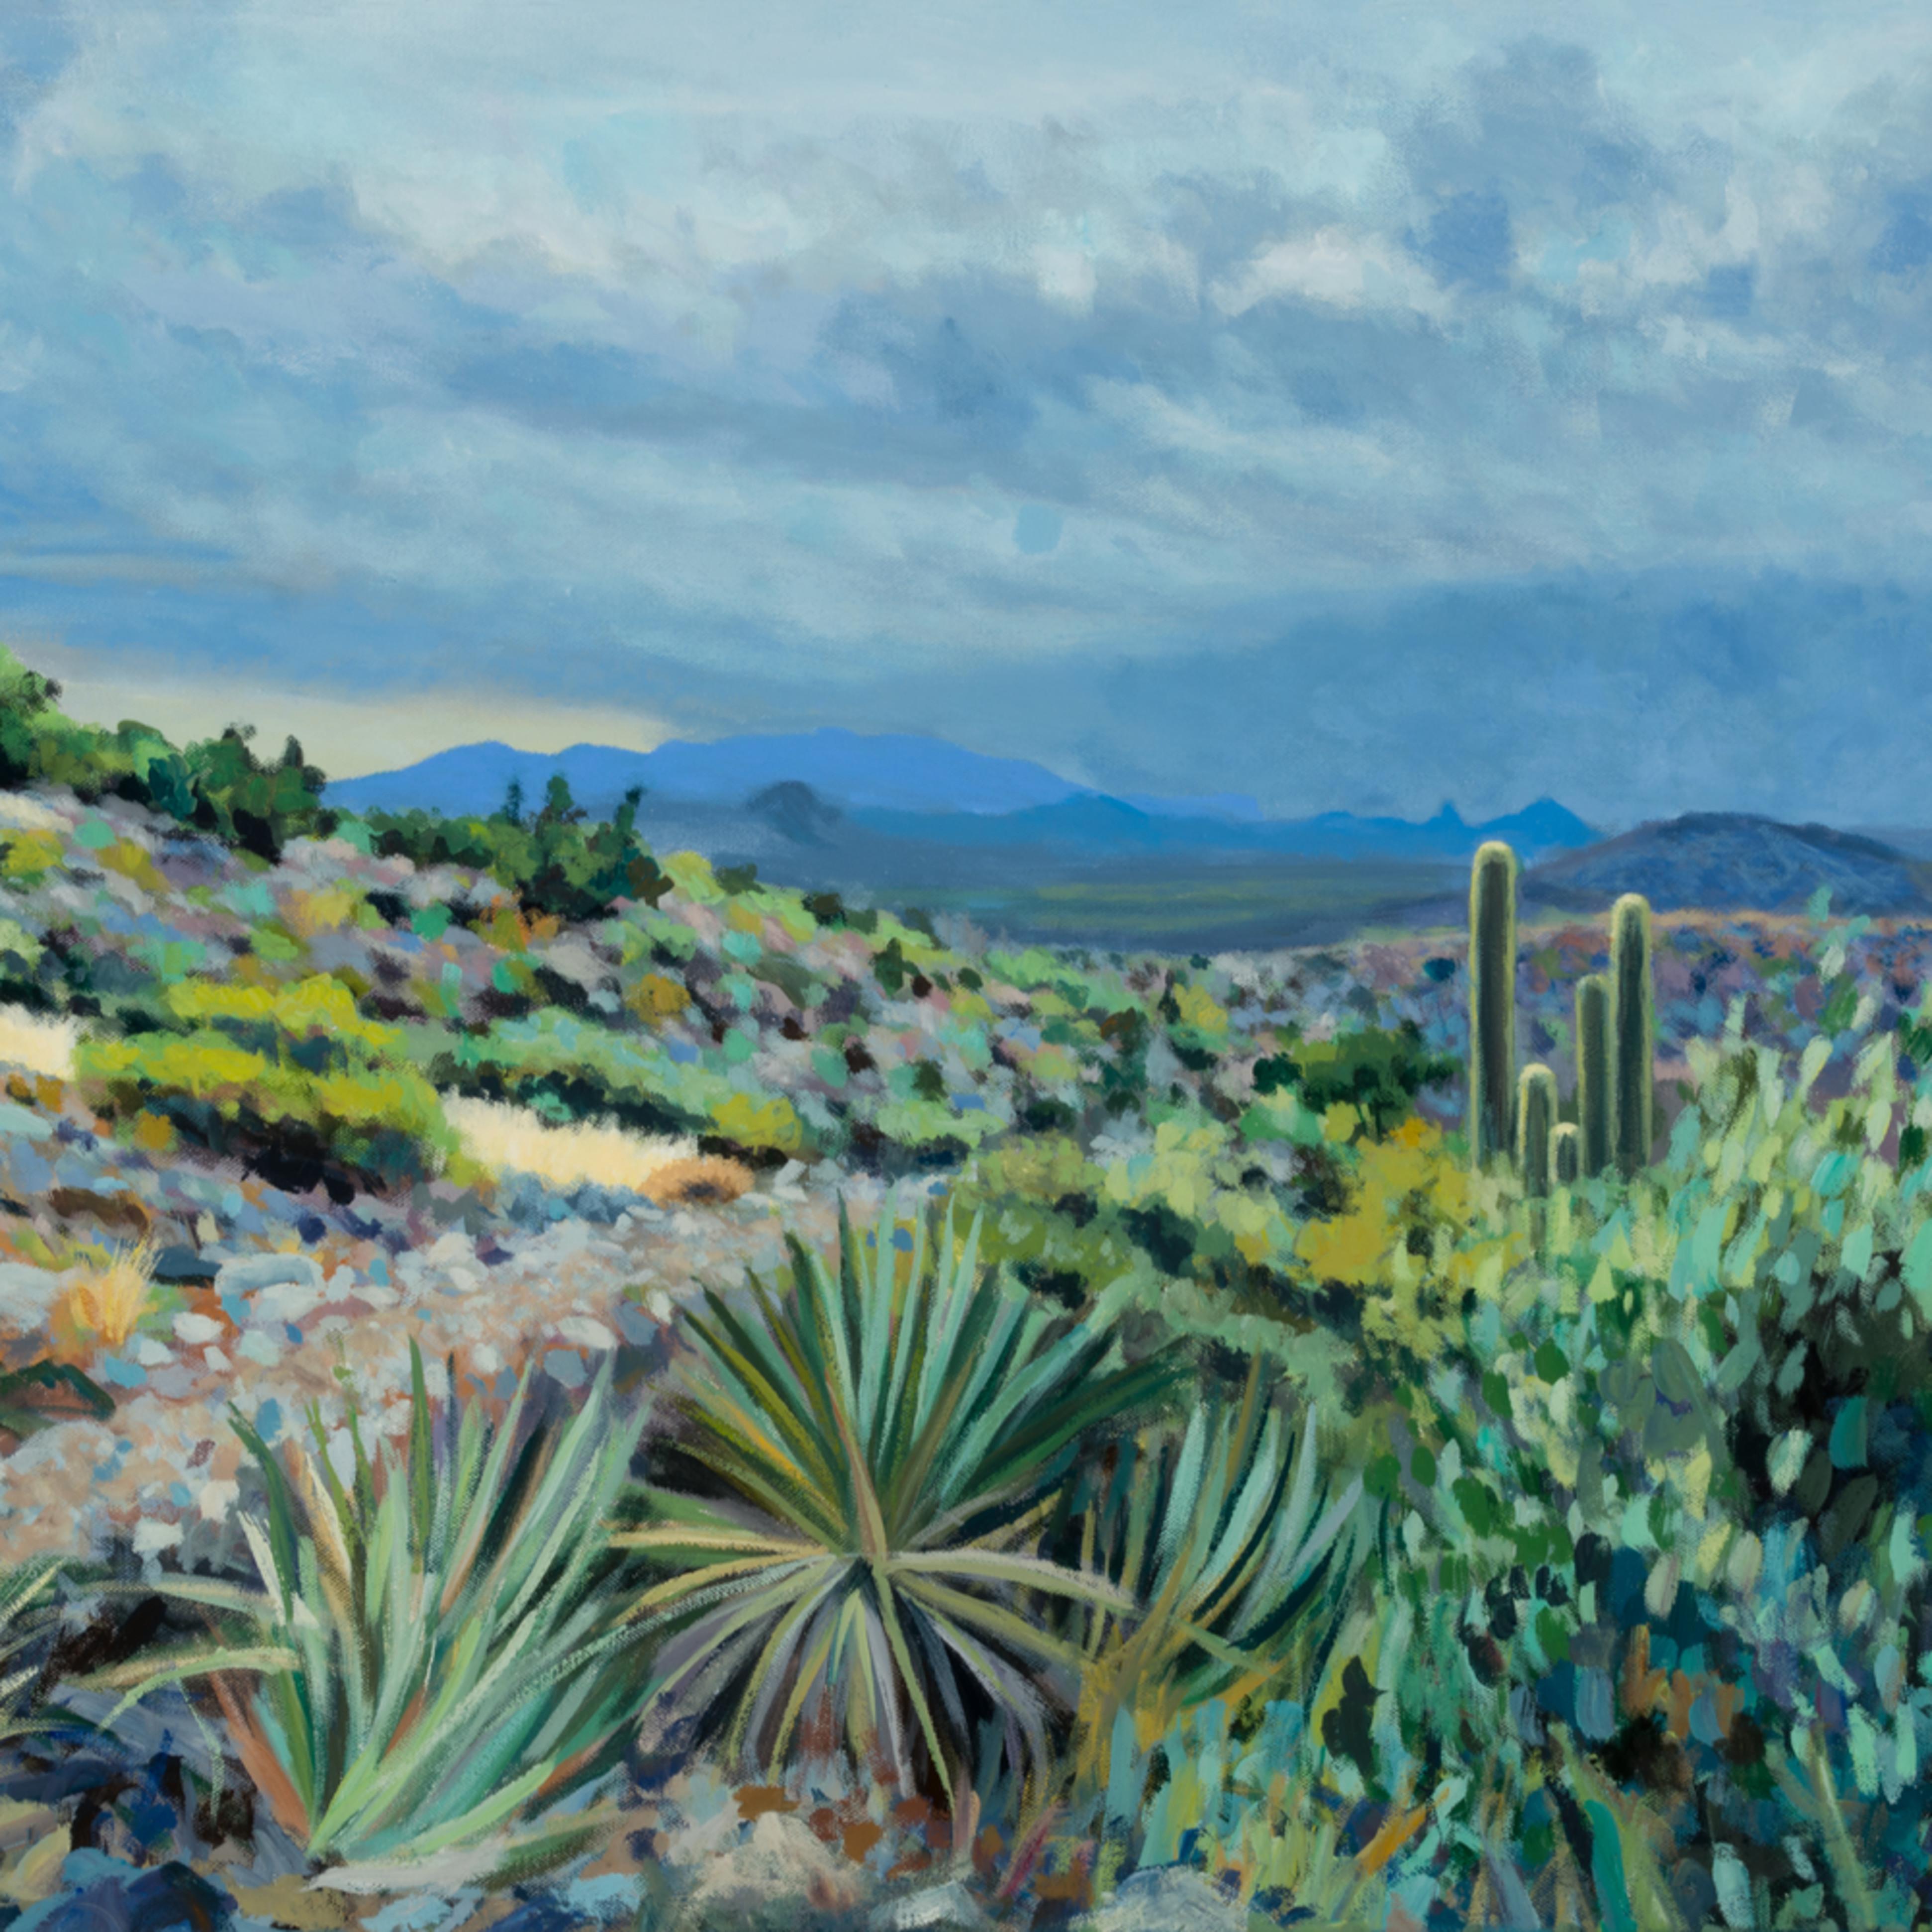 A desert mountain view zwkw9t